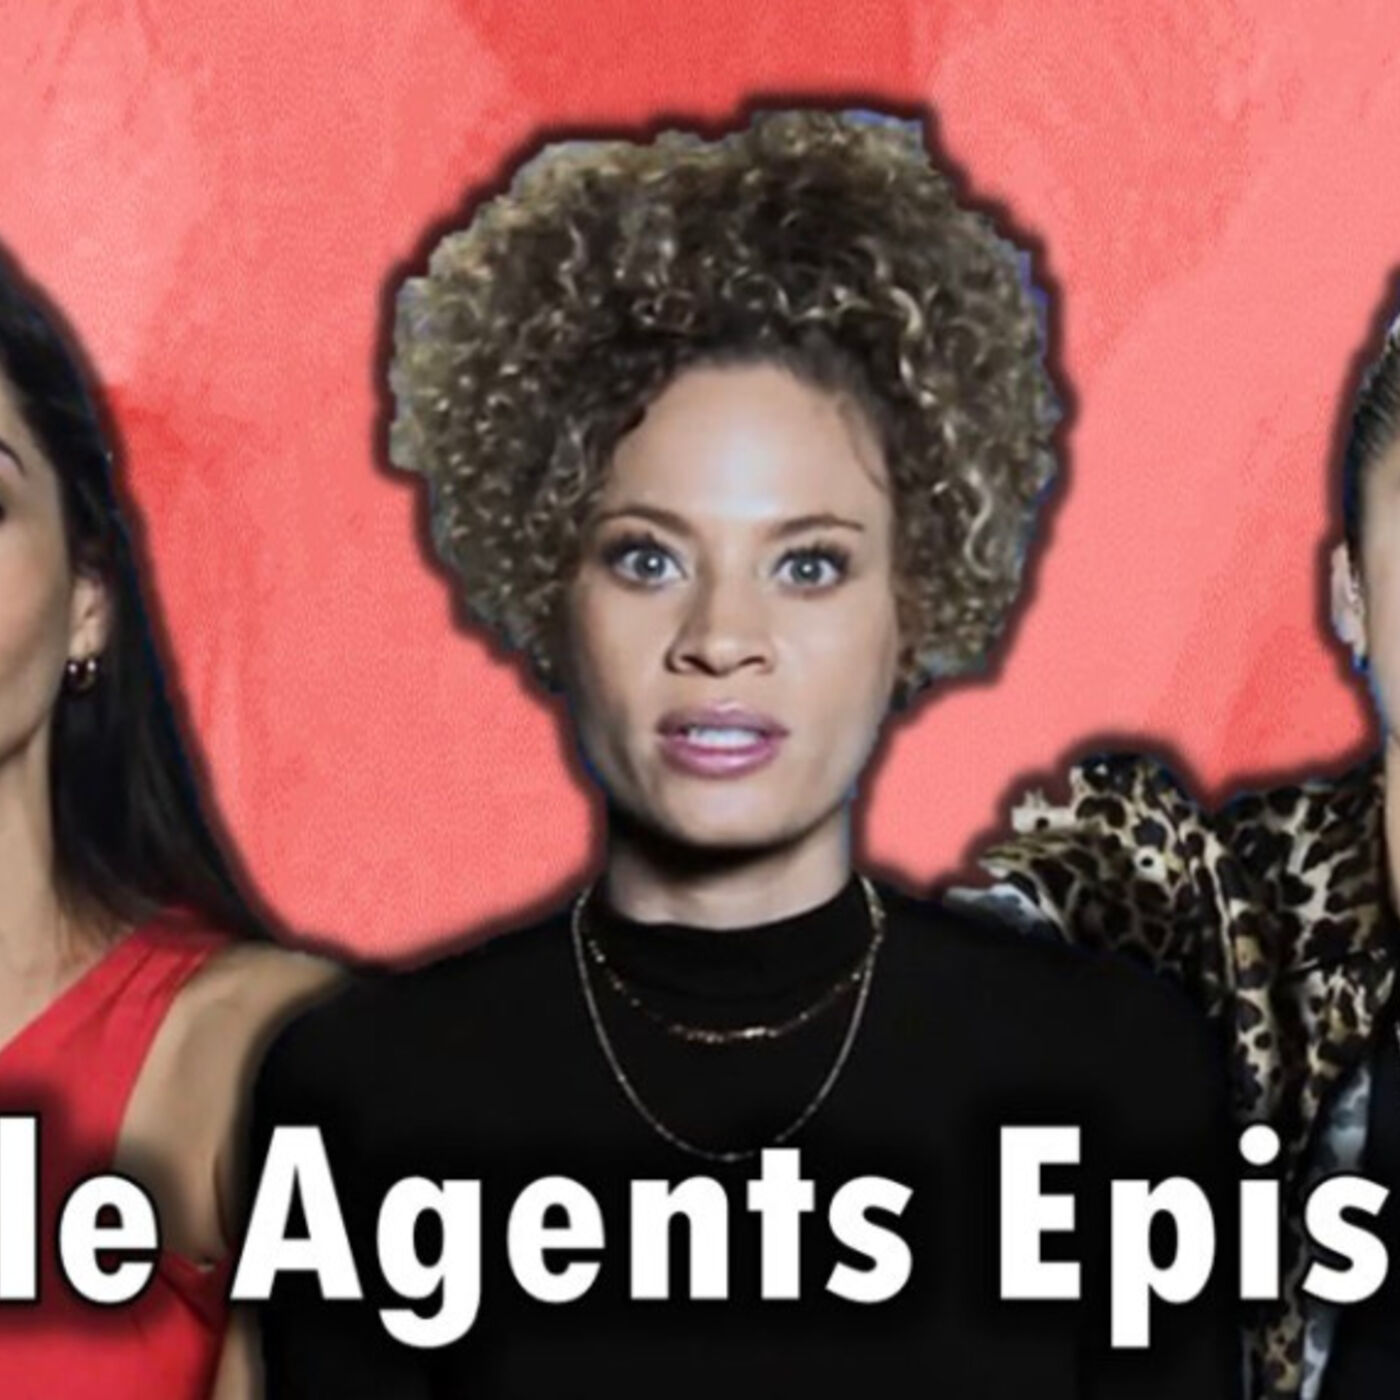 Challenge Double Agents Episode 9 Recap: Are Wolves Vegetarians?